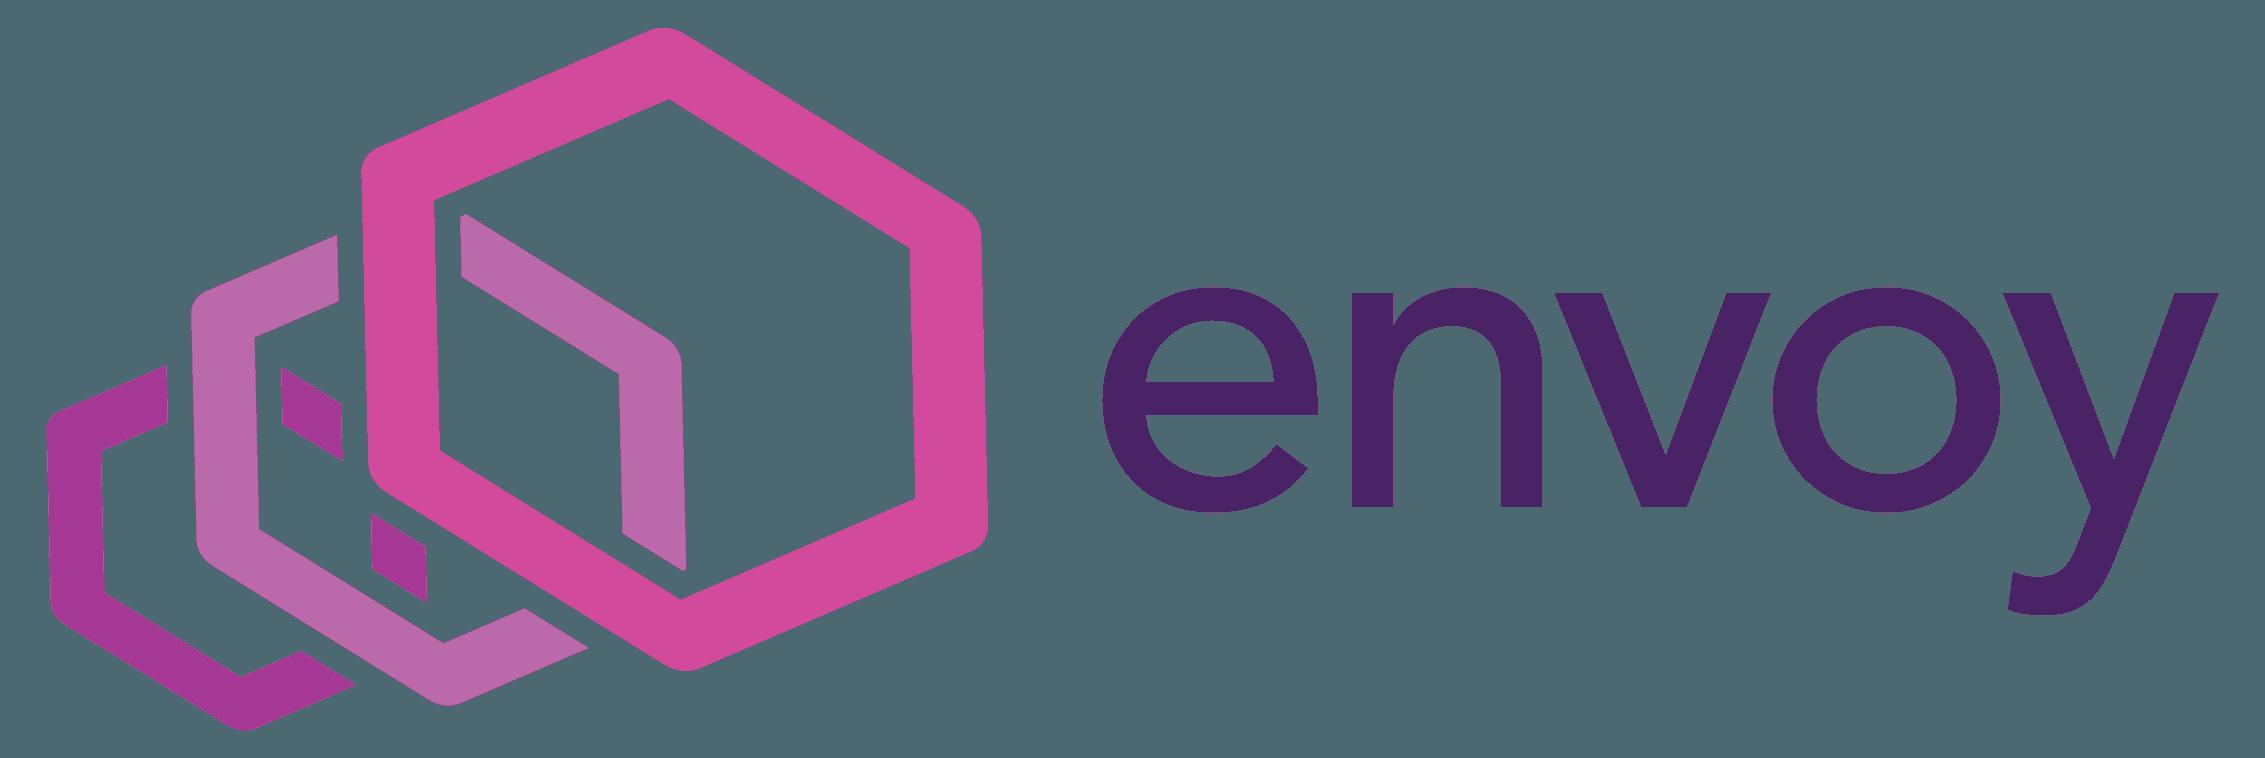 Envoy logo clipart png freeuse Envoy Logo - LogoDix png freeuse